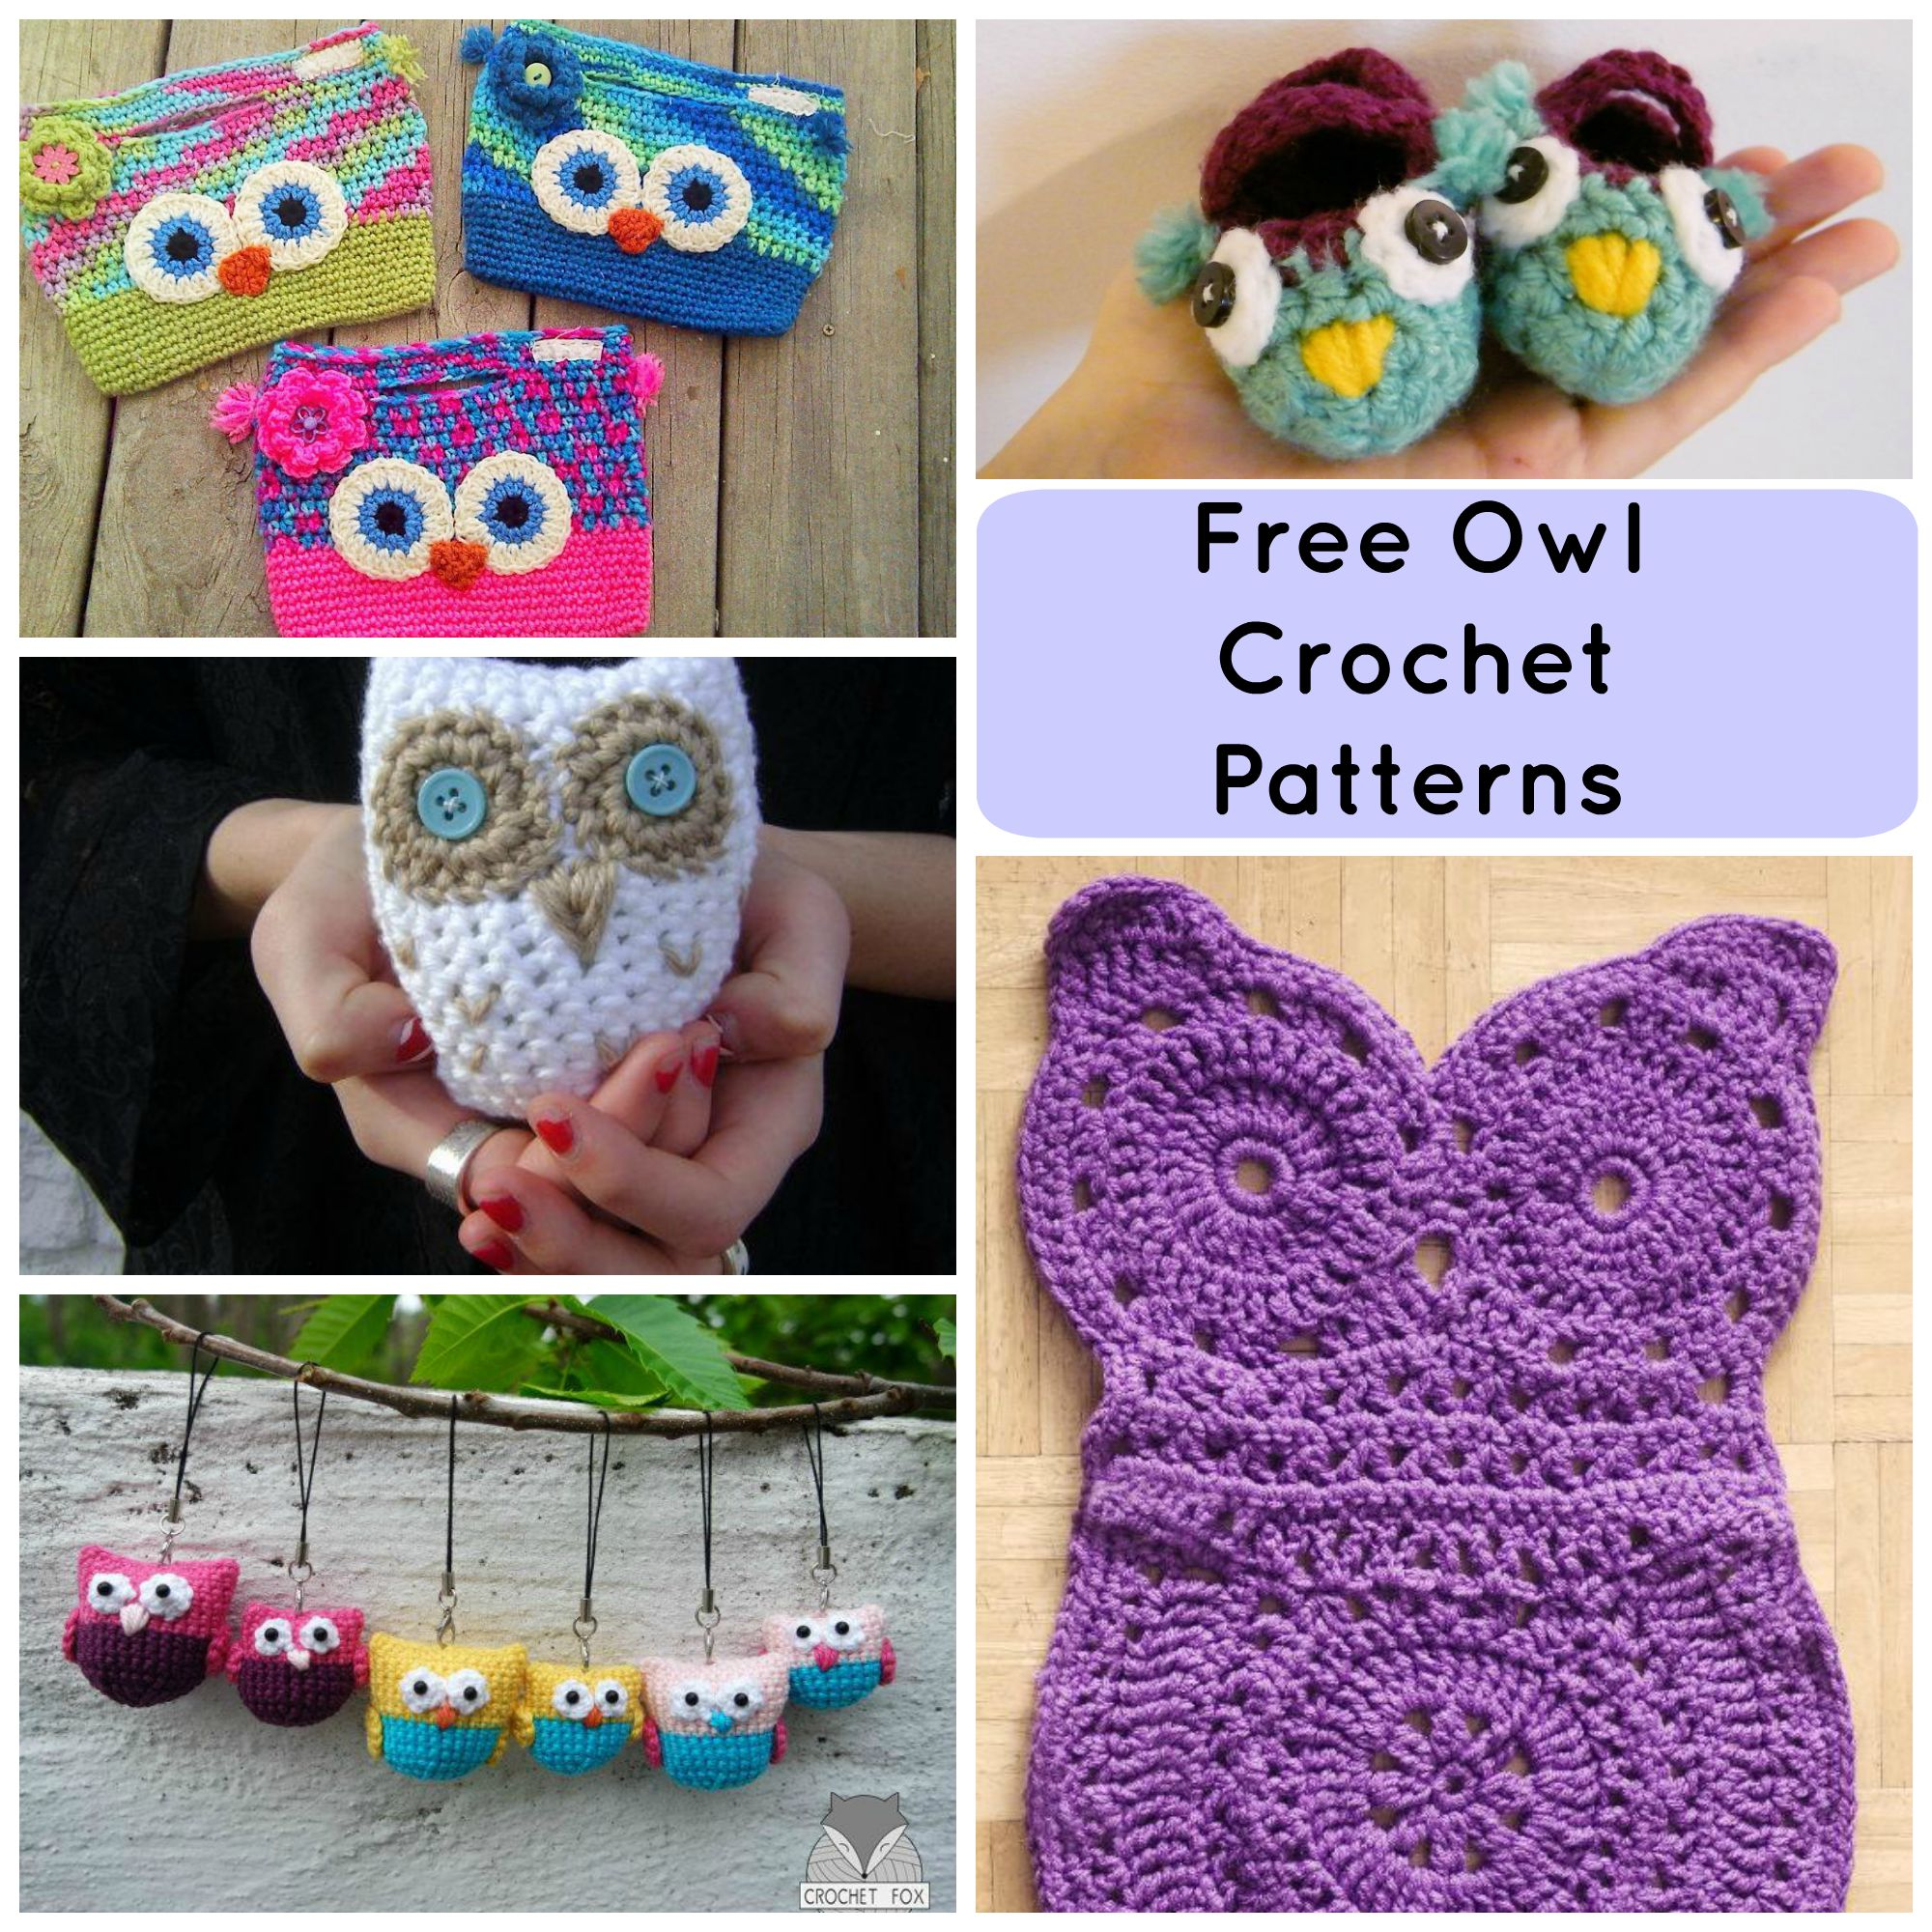 Free crochet patterns 7 hoot-worthy free crochet owl patterns pouetze